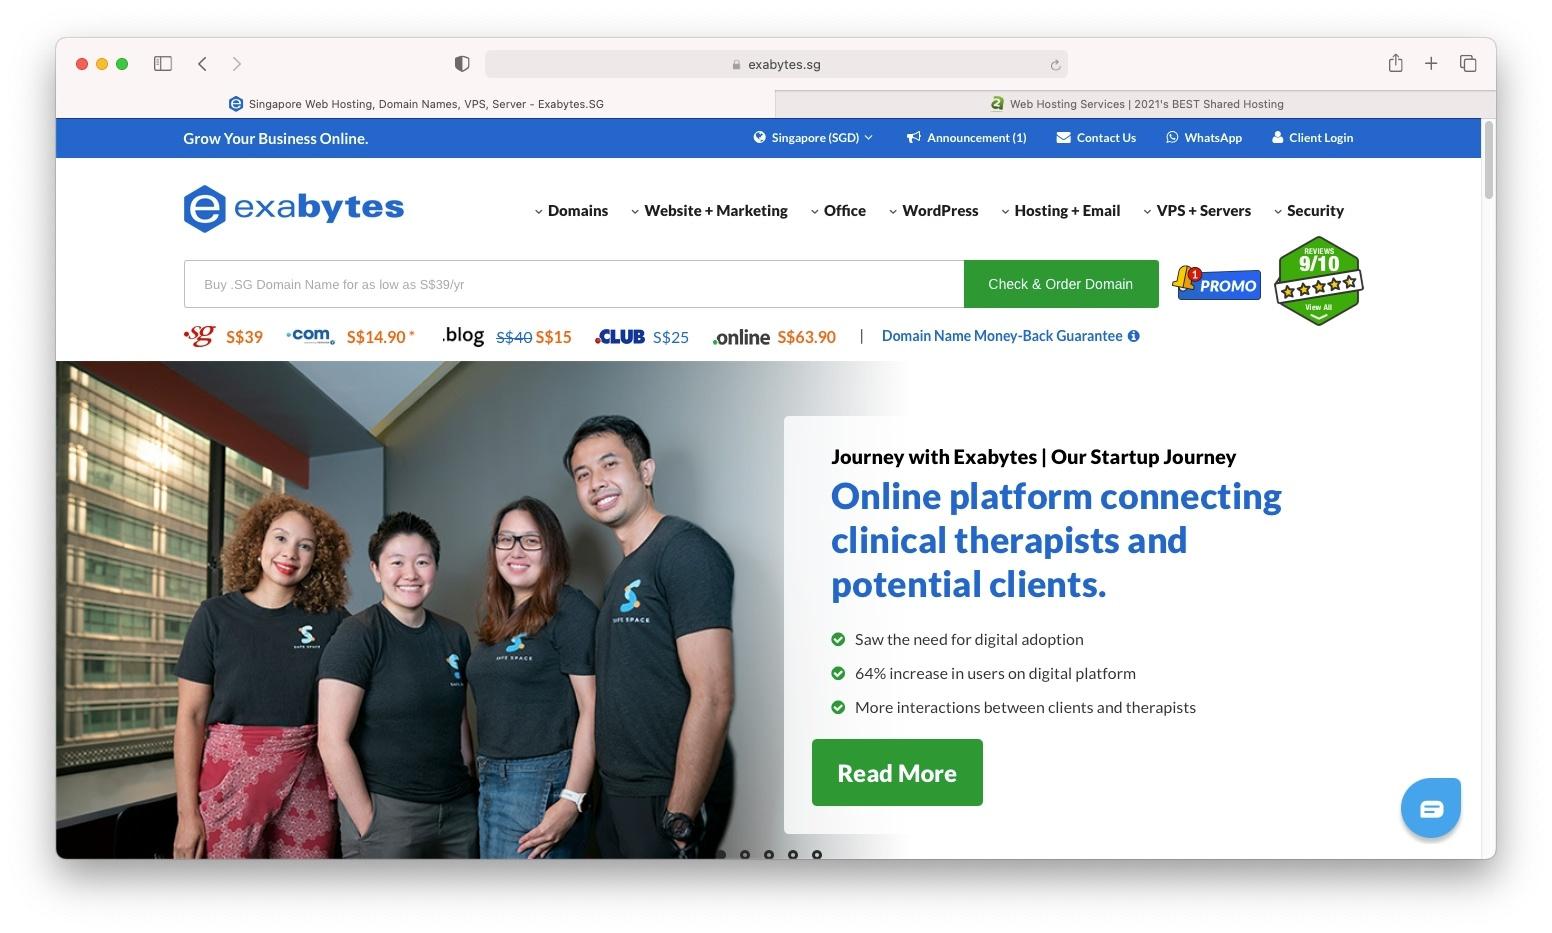 Best web hosting Singapore includes local company Exabytes